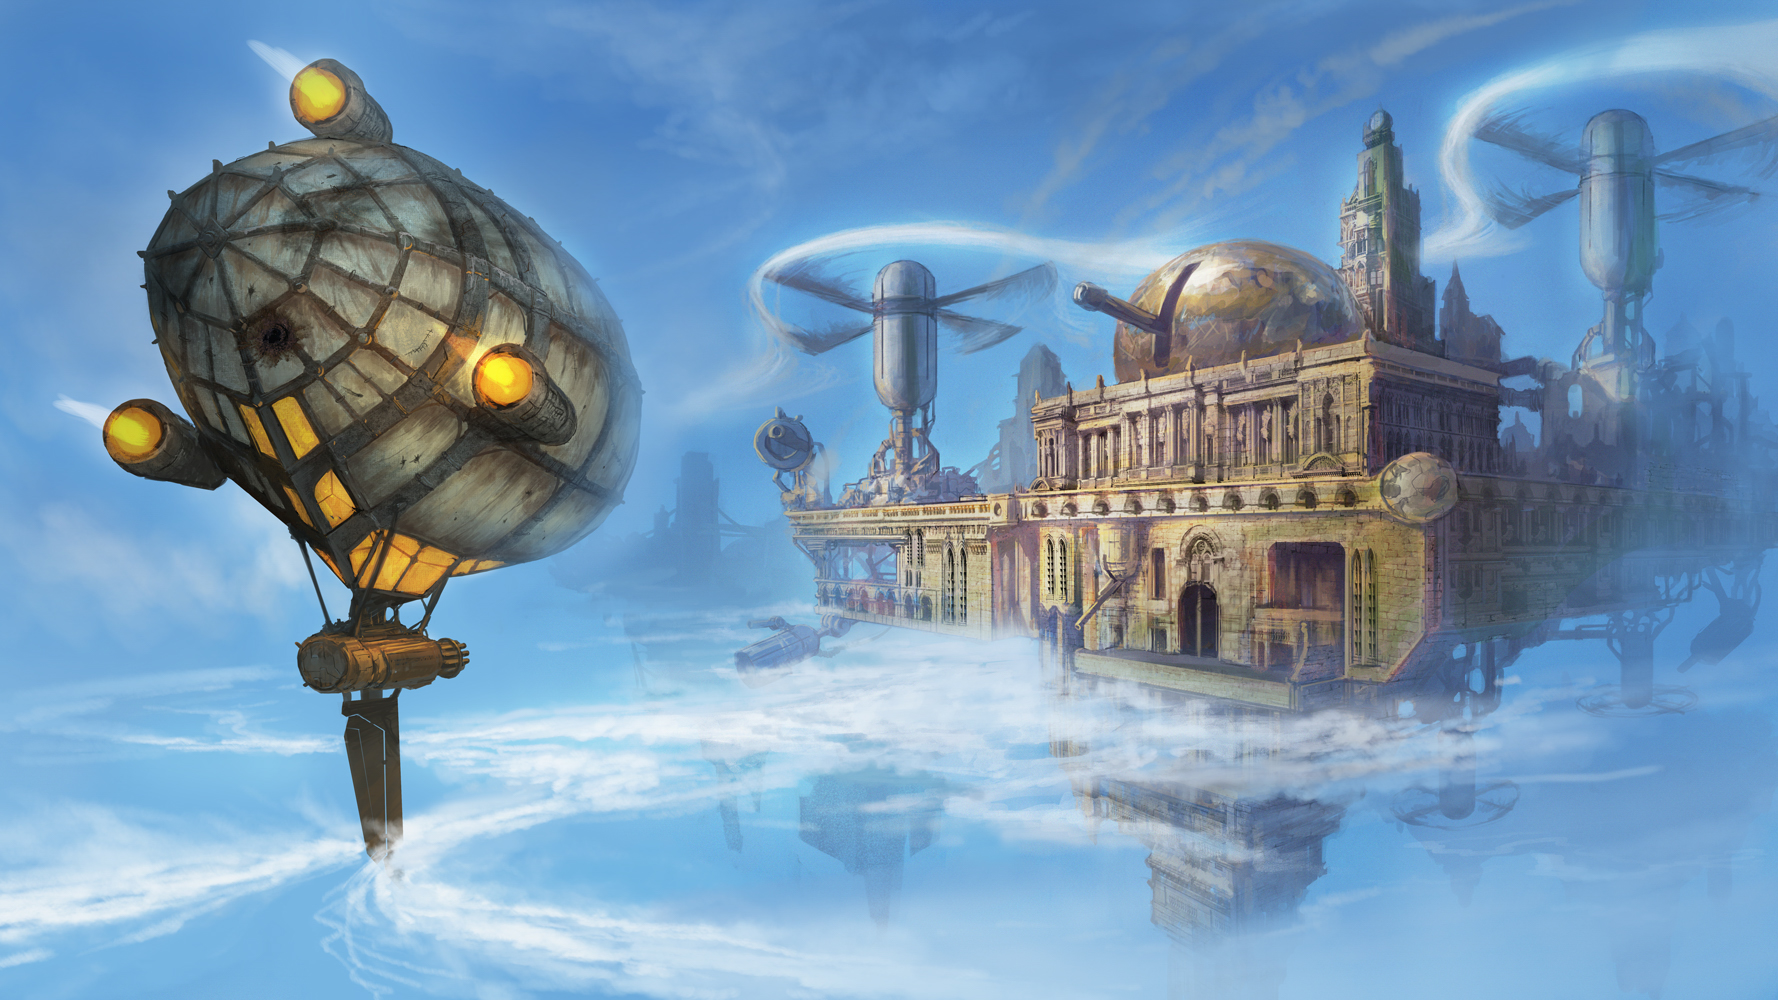 Bill Thompson - Environment Sketches - cREAtive Castle Studios 4.jpg